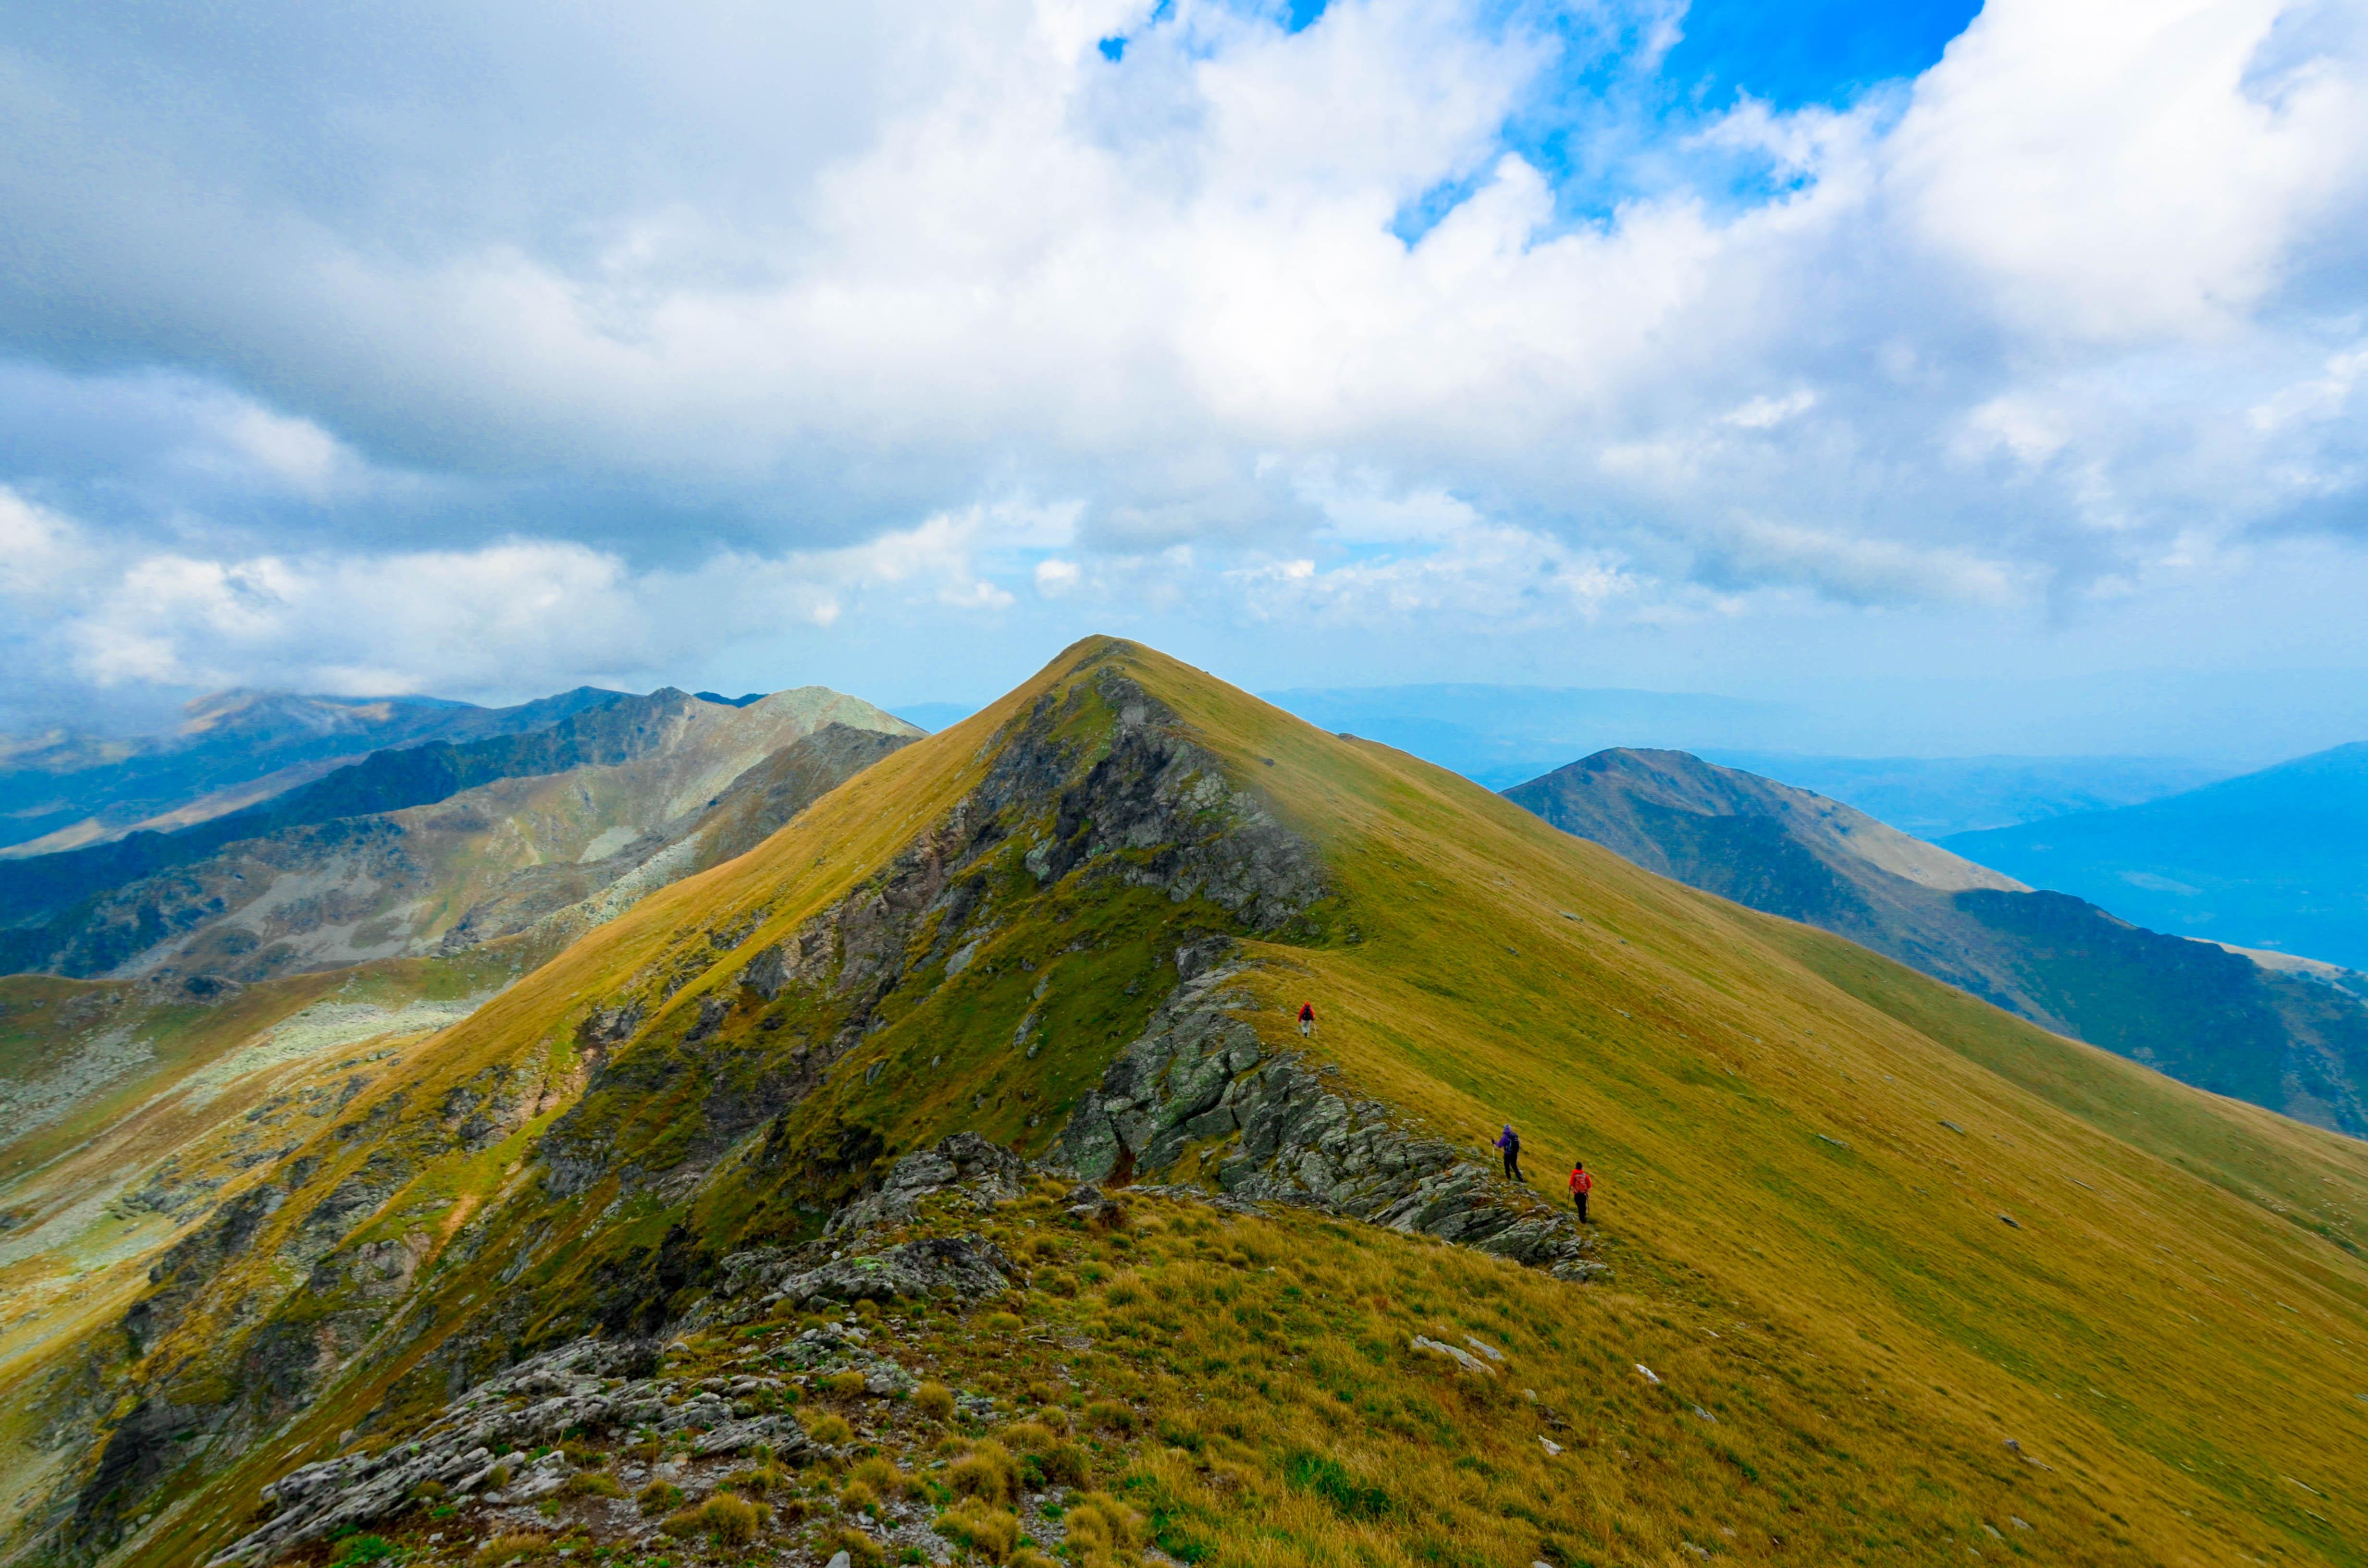 Hiking the Sharr Mountains